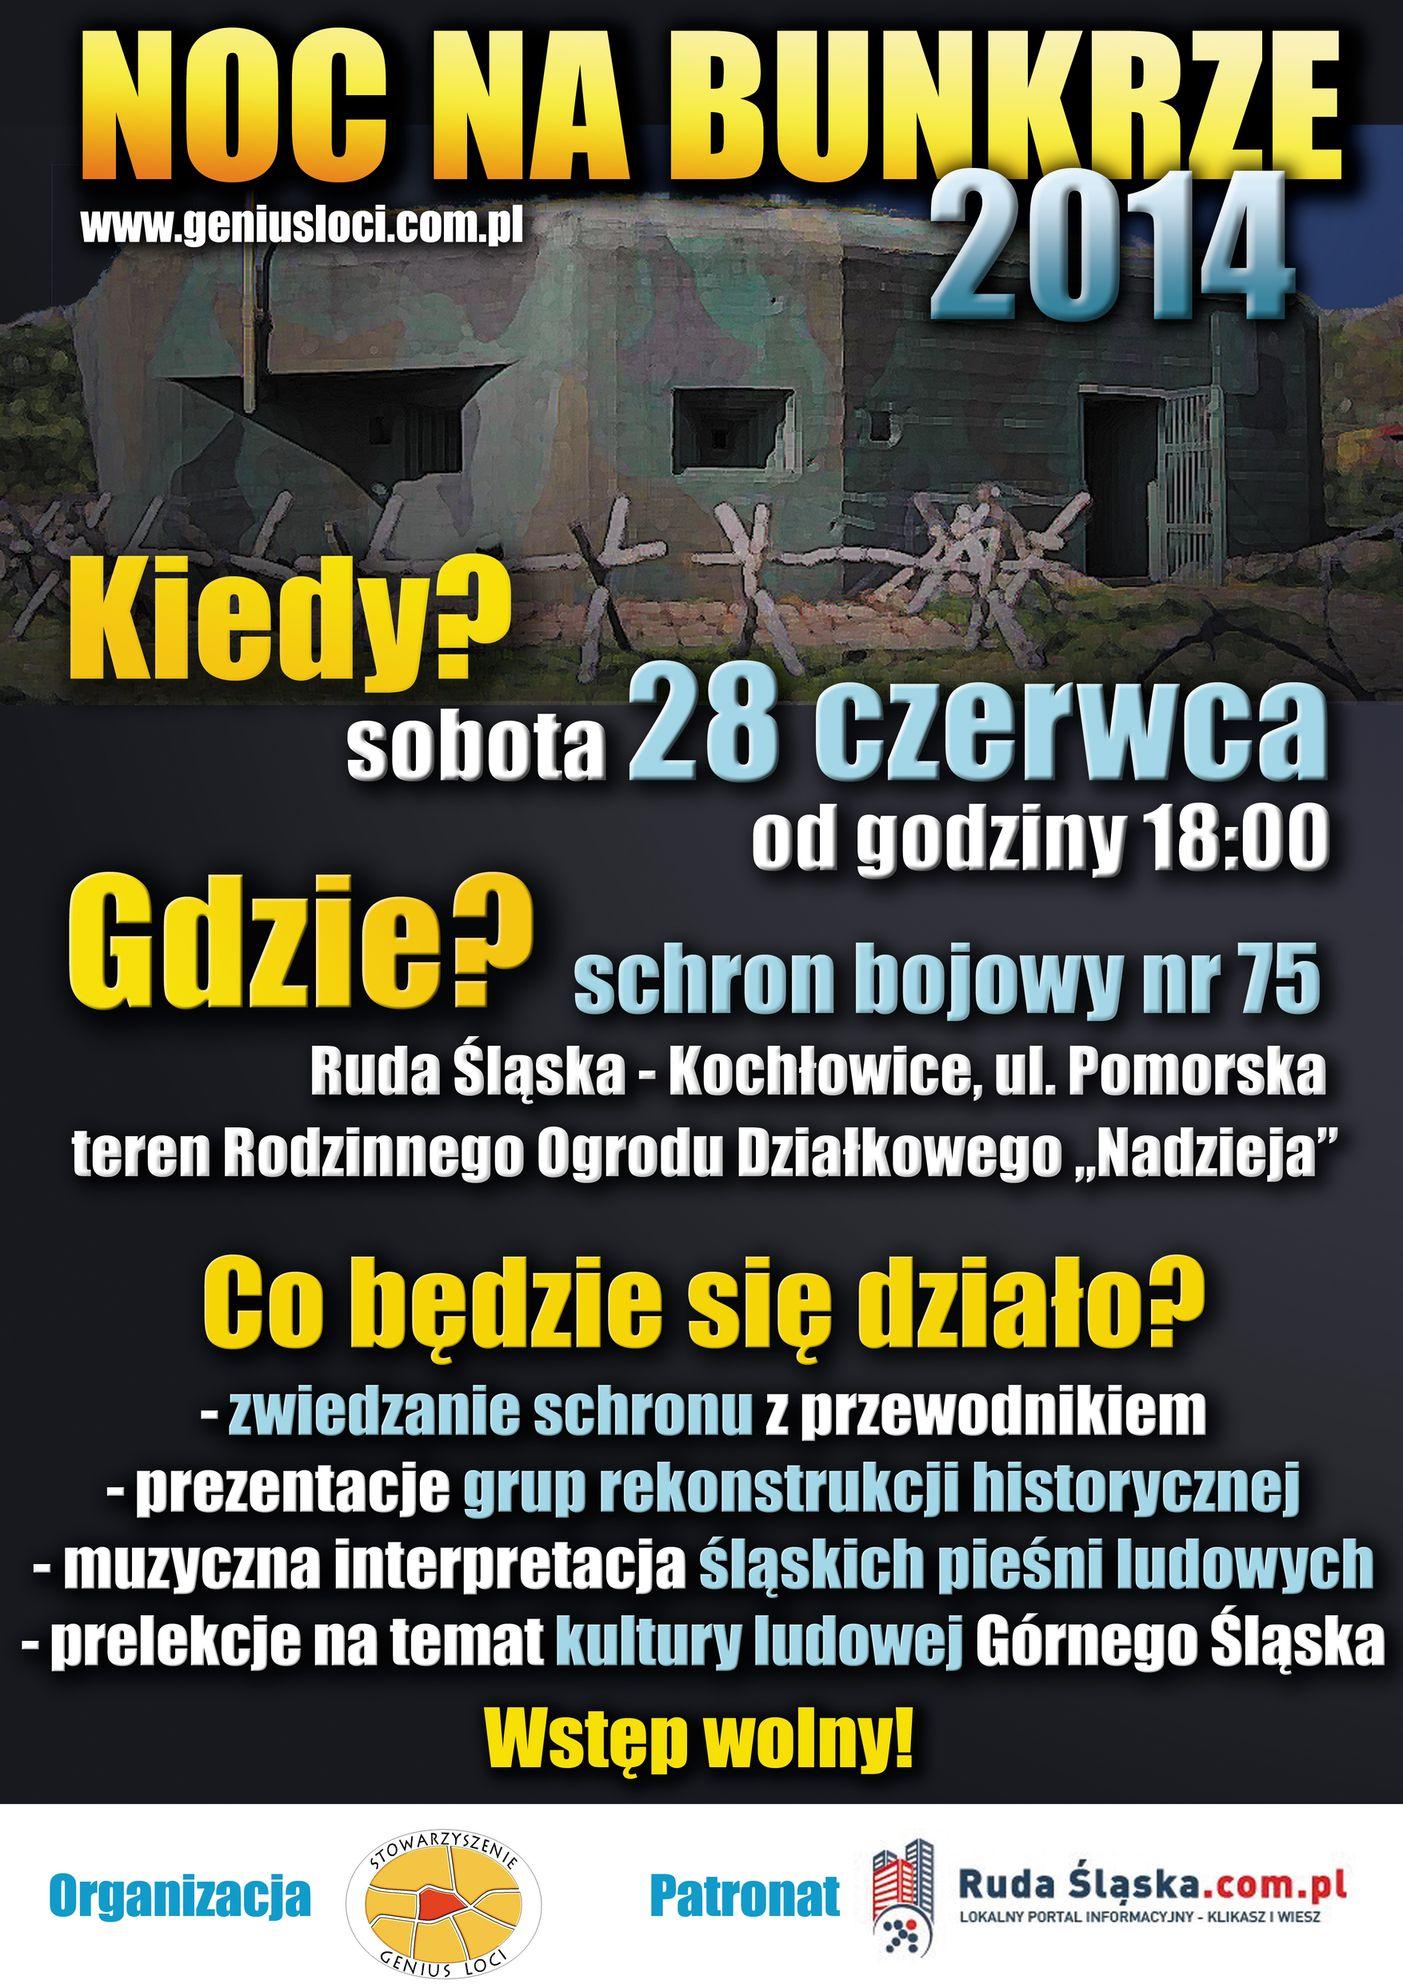 Noc-na-bunkrze-2014-plakat-small